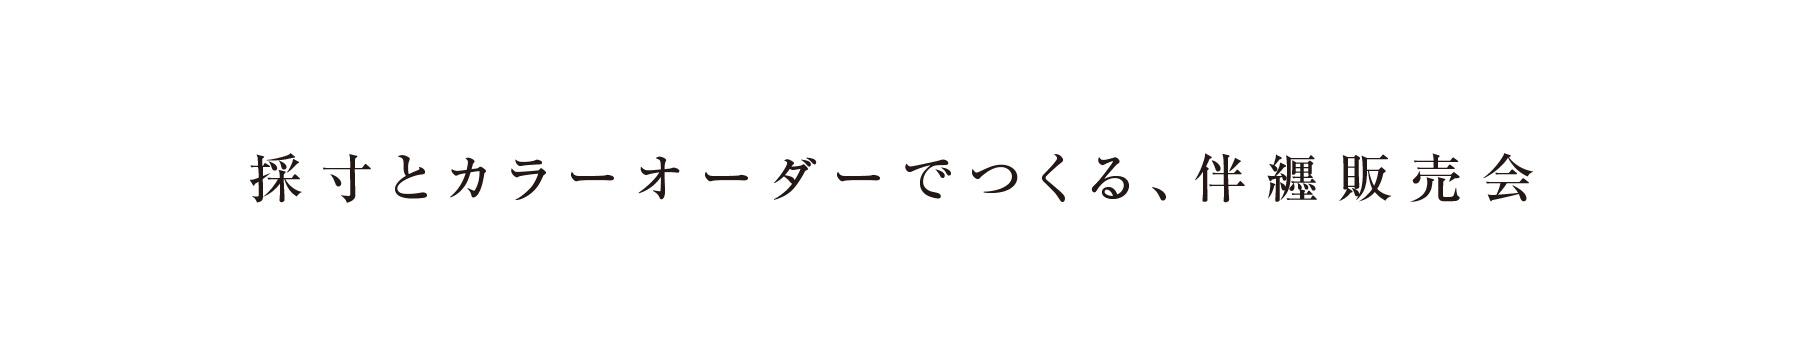 PHAETON 伴纒展